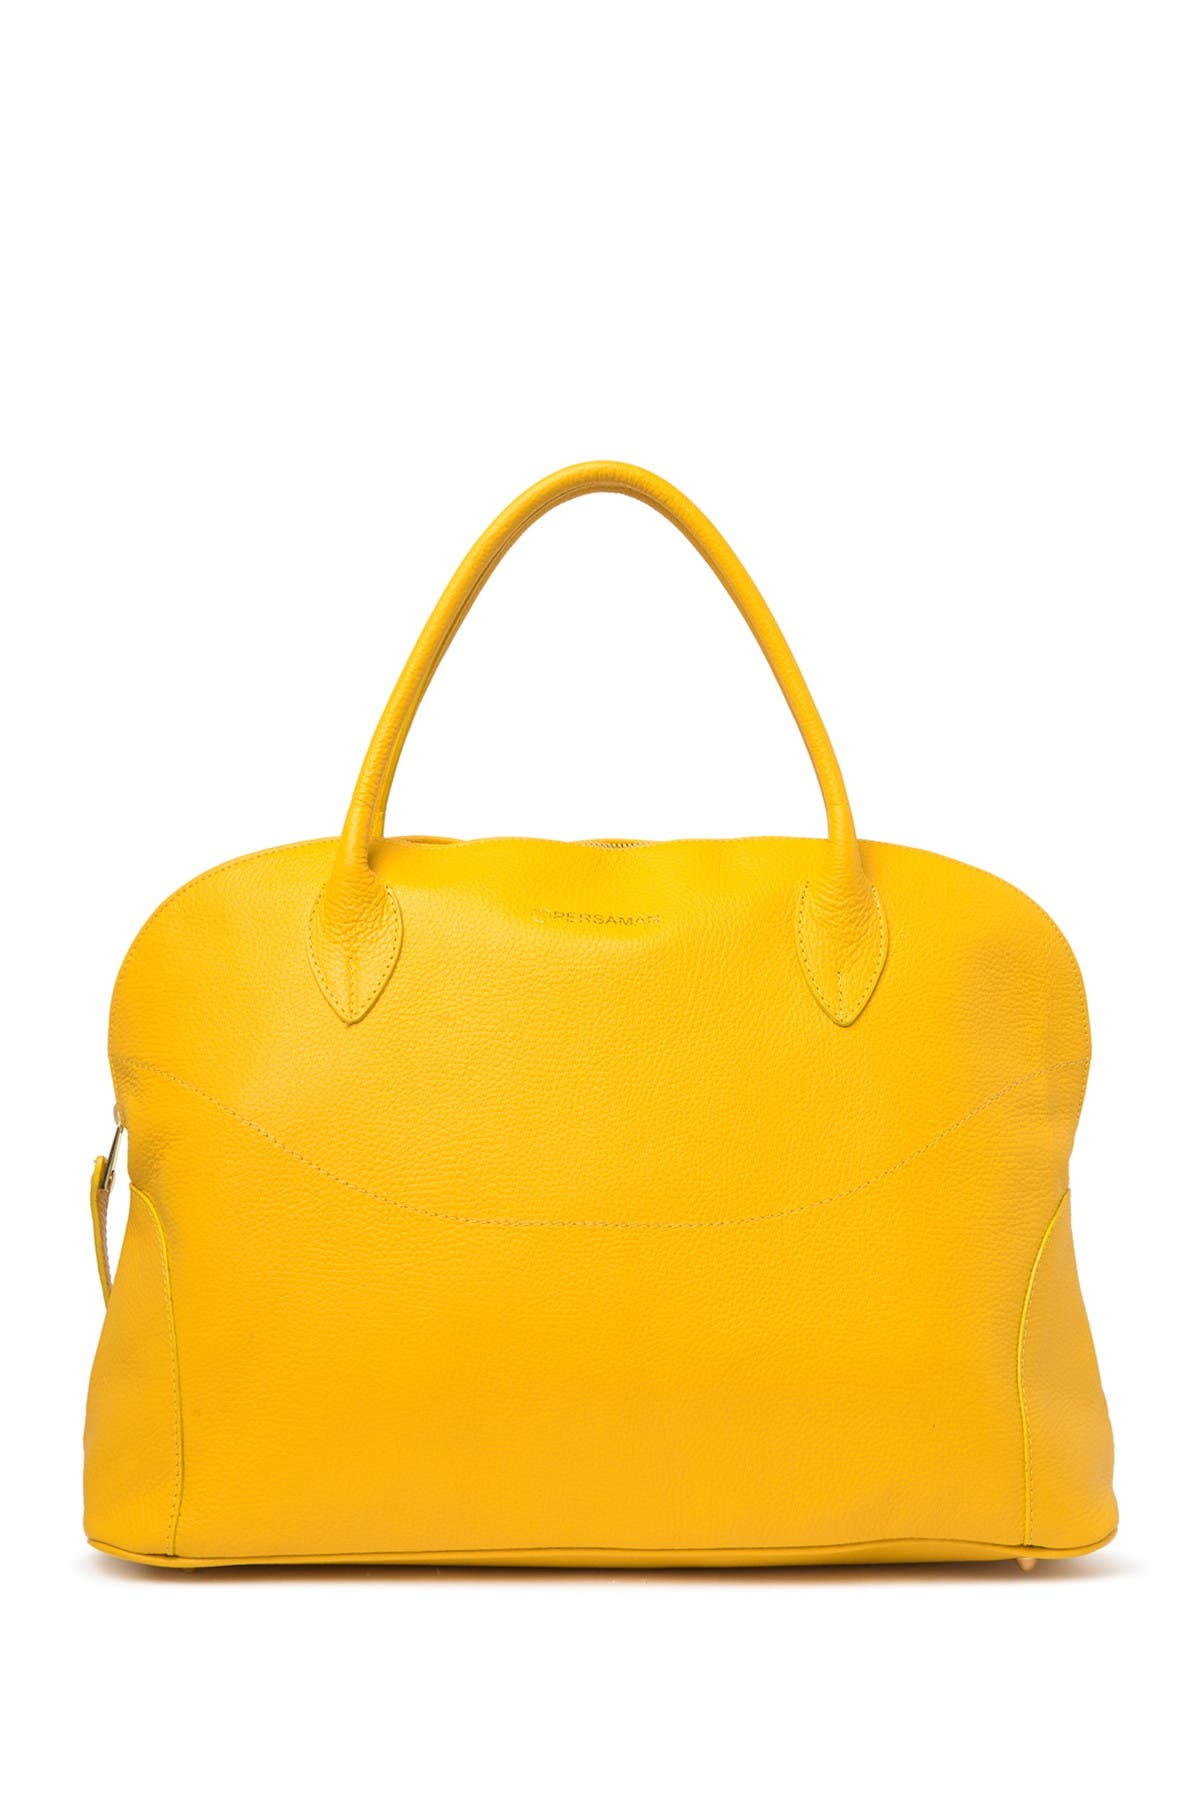 Persaman New York Jollie Satchel Bag at Nordstrom Rack